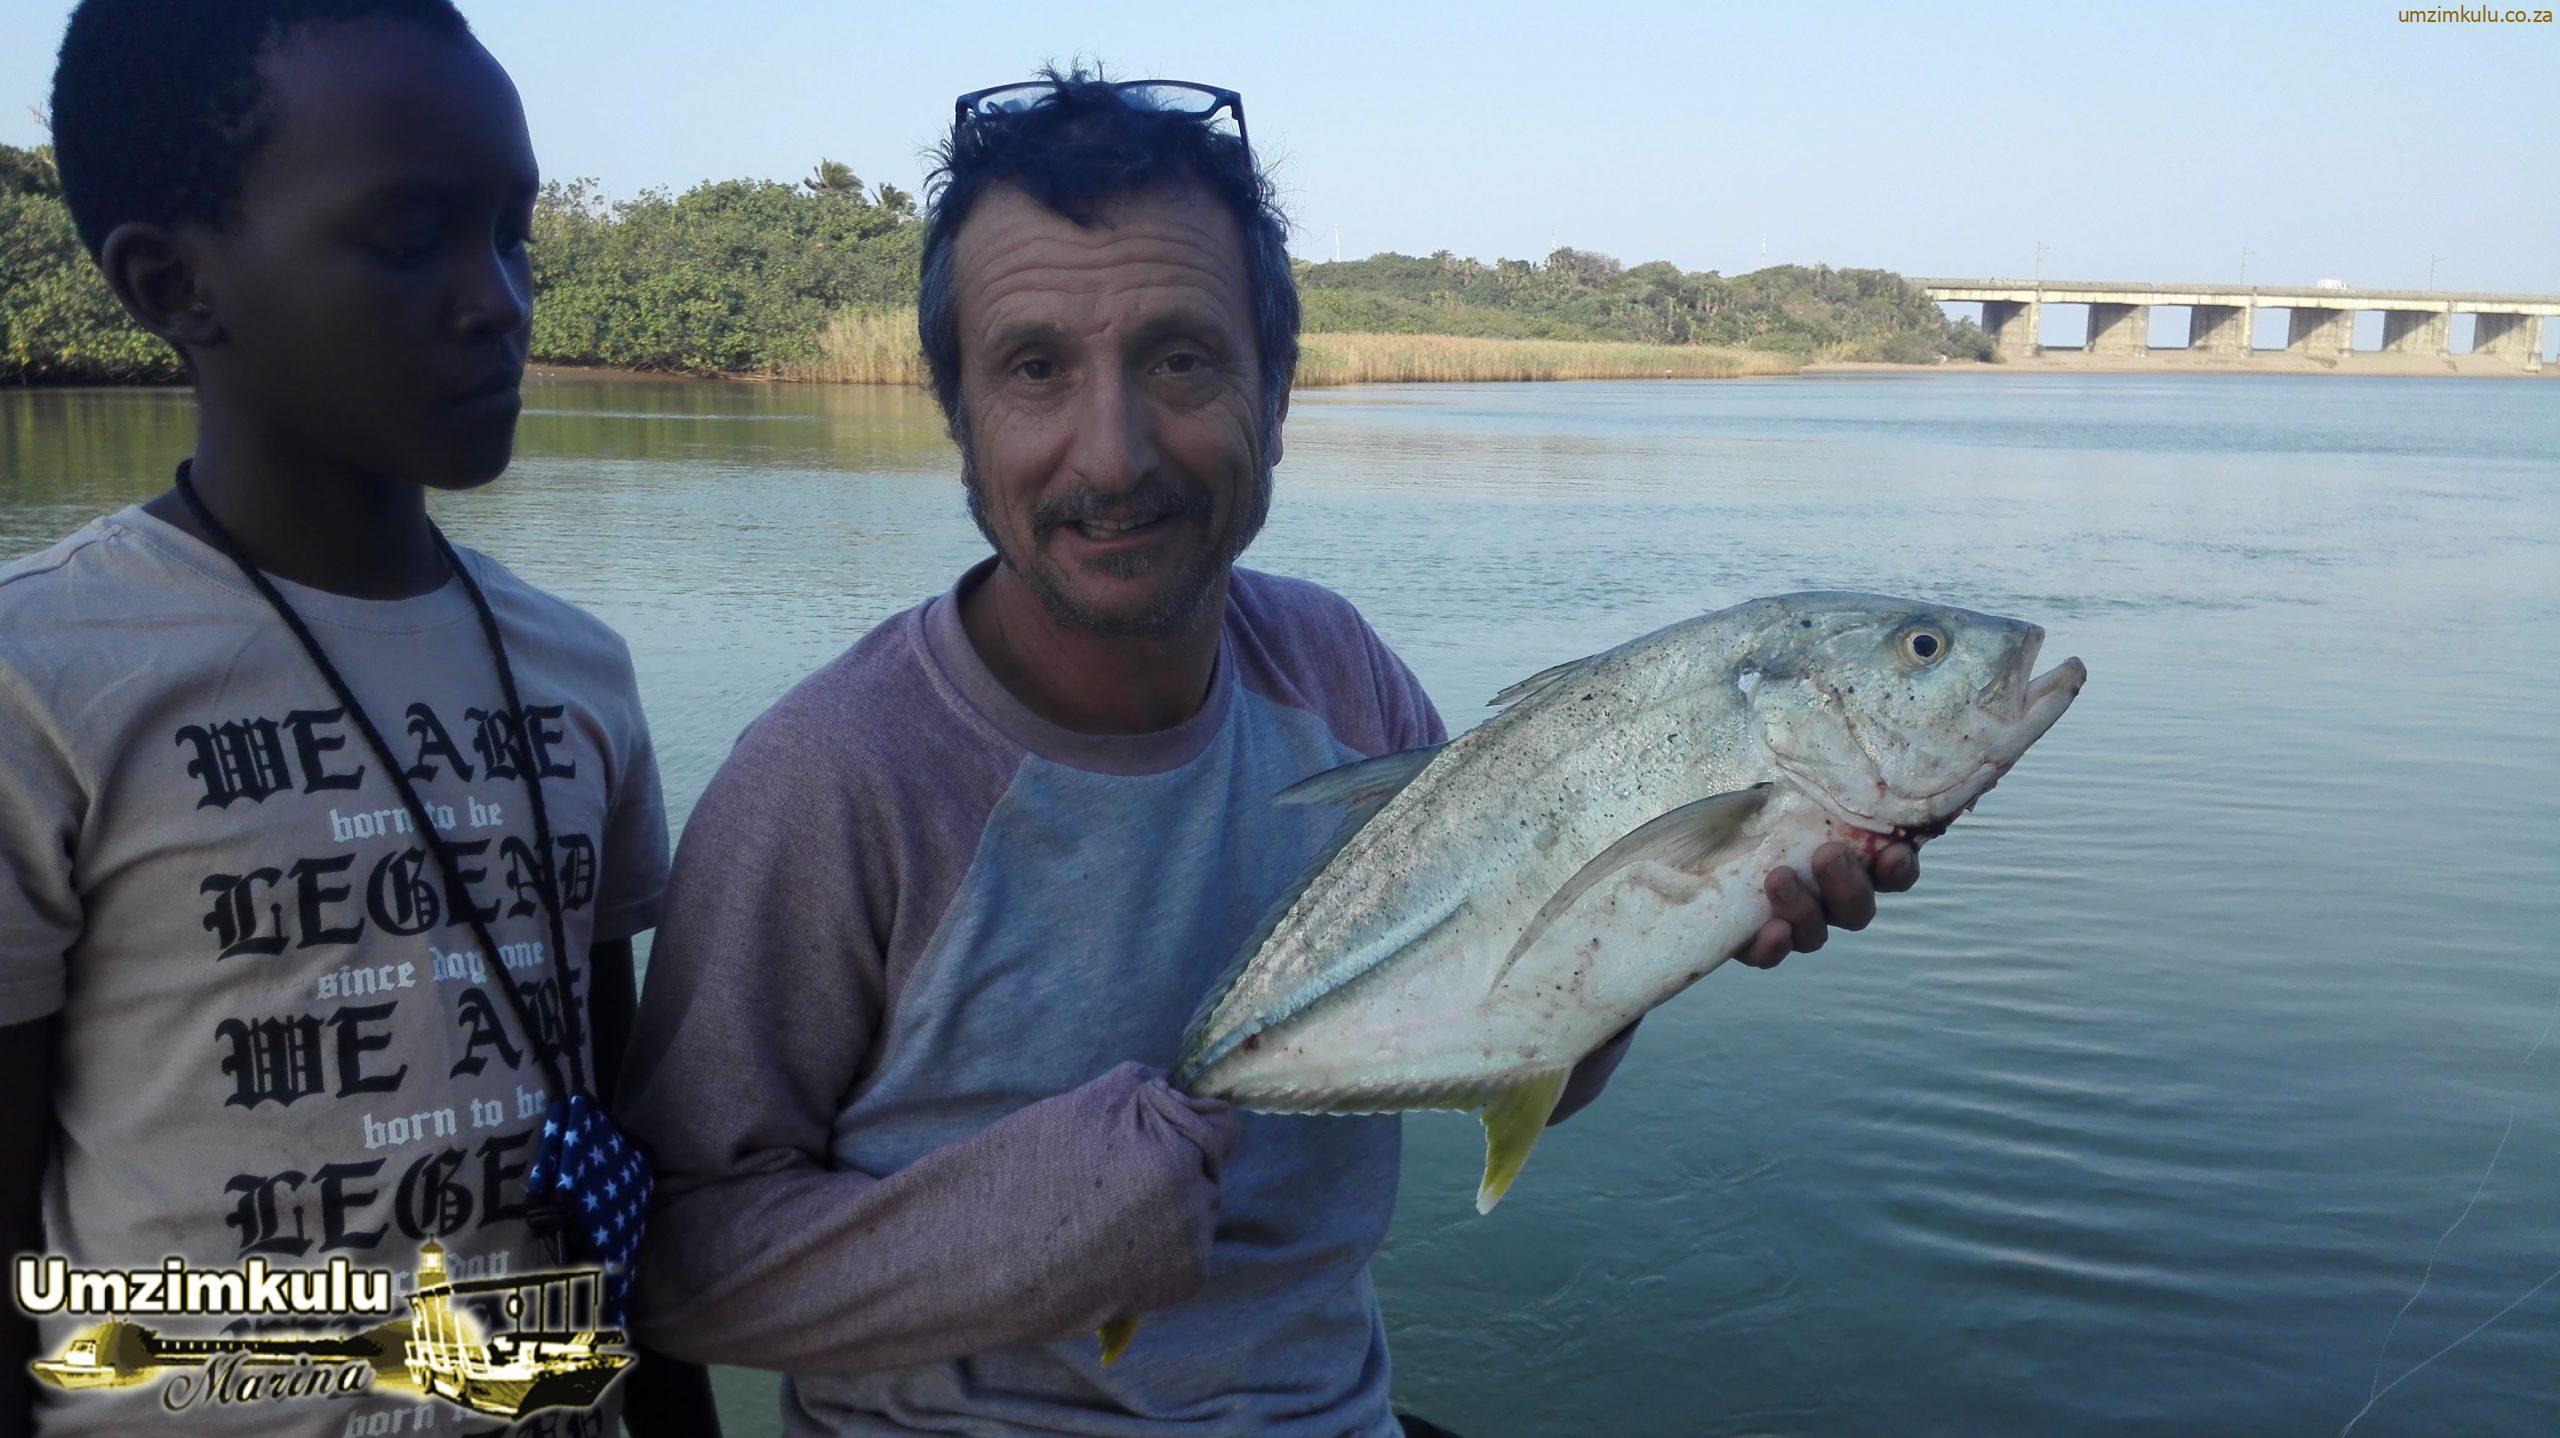 Victor and Sean Blacktip Kingfish at Fishing School 2020 in the Umzimkulu